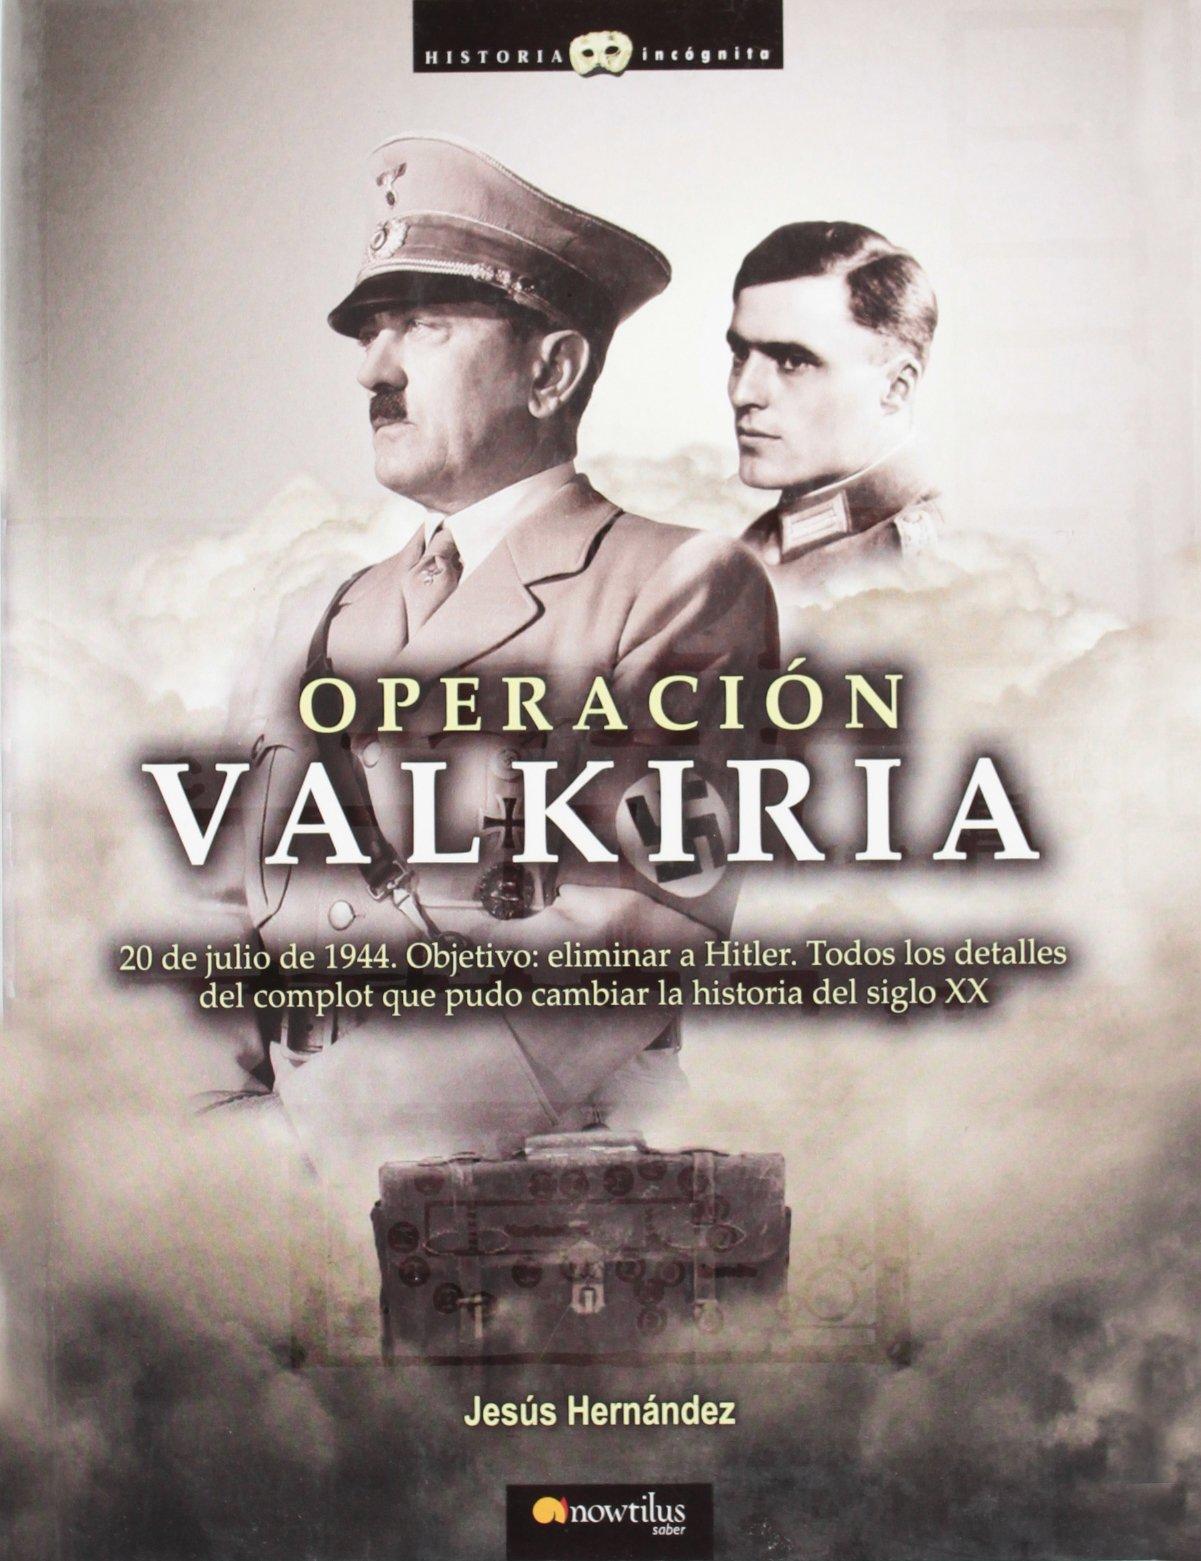 Download Operacion Valkiria/ Operation Valkyrie (Historia Incognita/ Mysterious History) (Spanish Edition) (Historia incognita / Unknown History) pdf epub